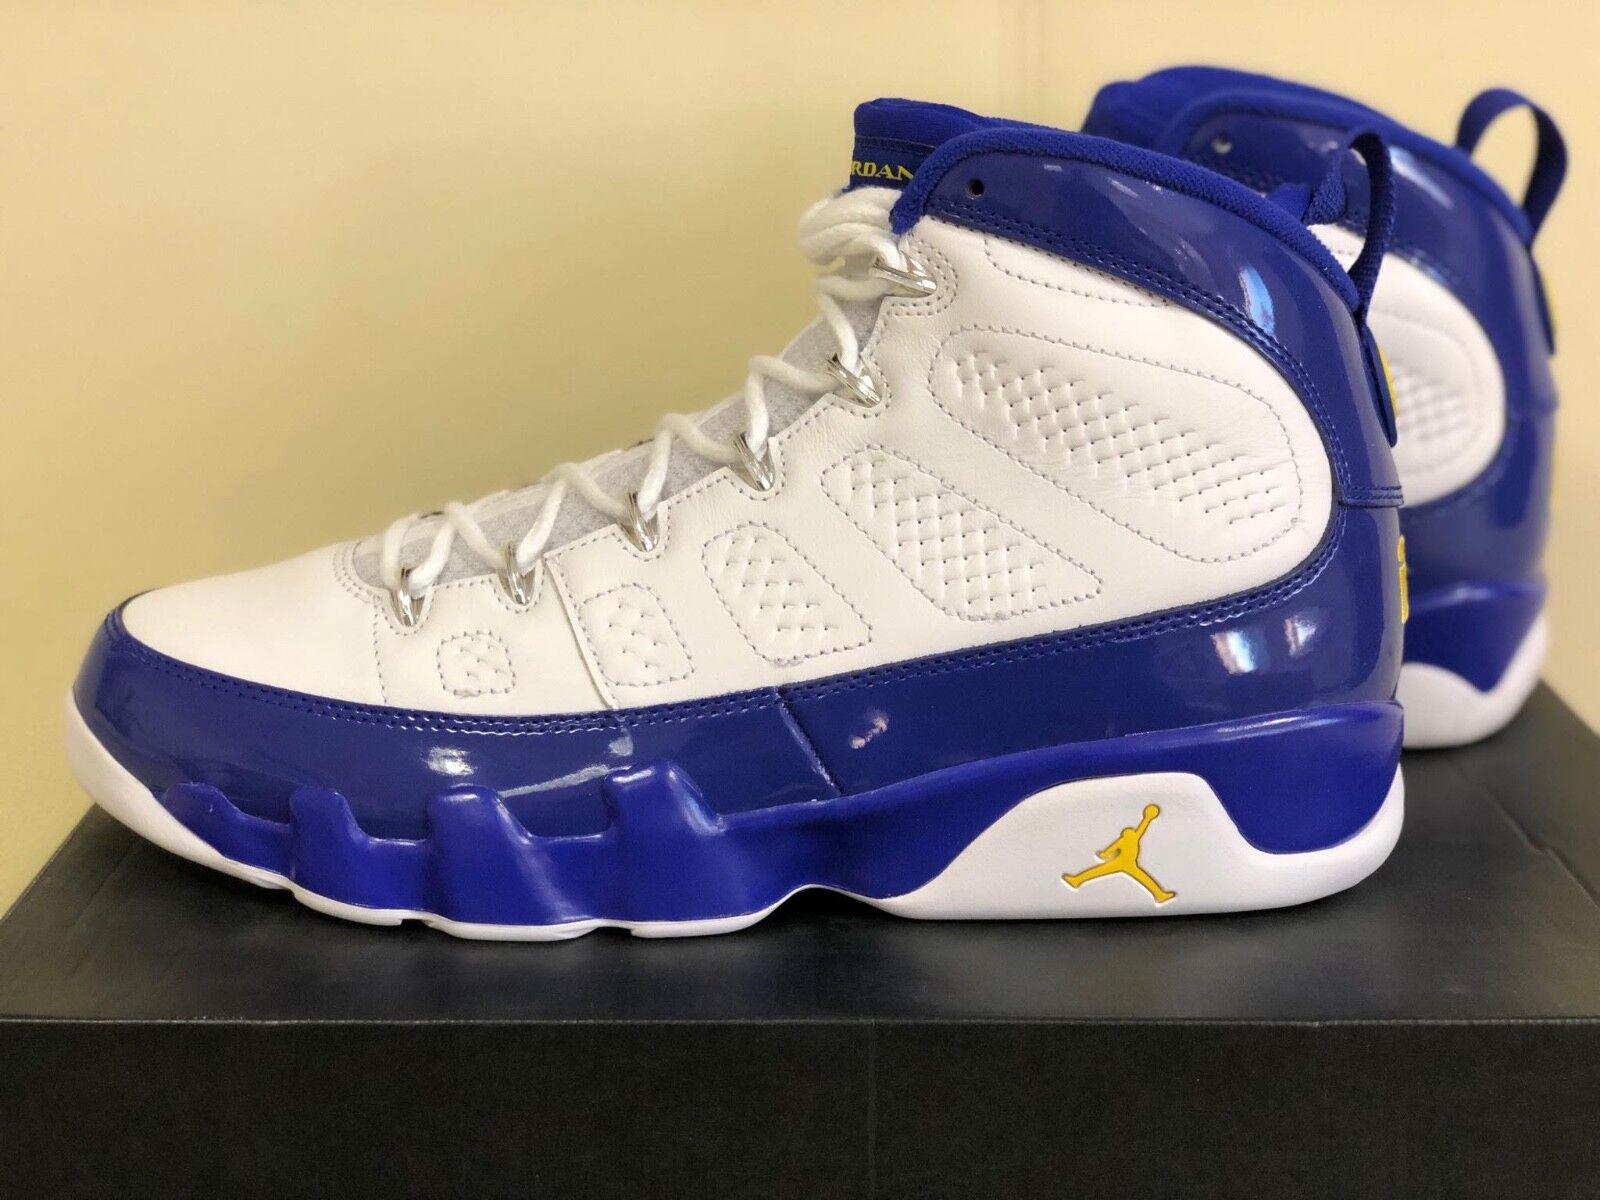 Jordan 9 Retro Kobe Air Bryant PE 302370-121 Tour Amarillo Zapatos de baloncesto US10.5